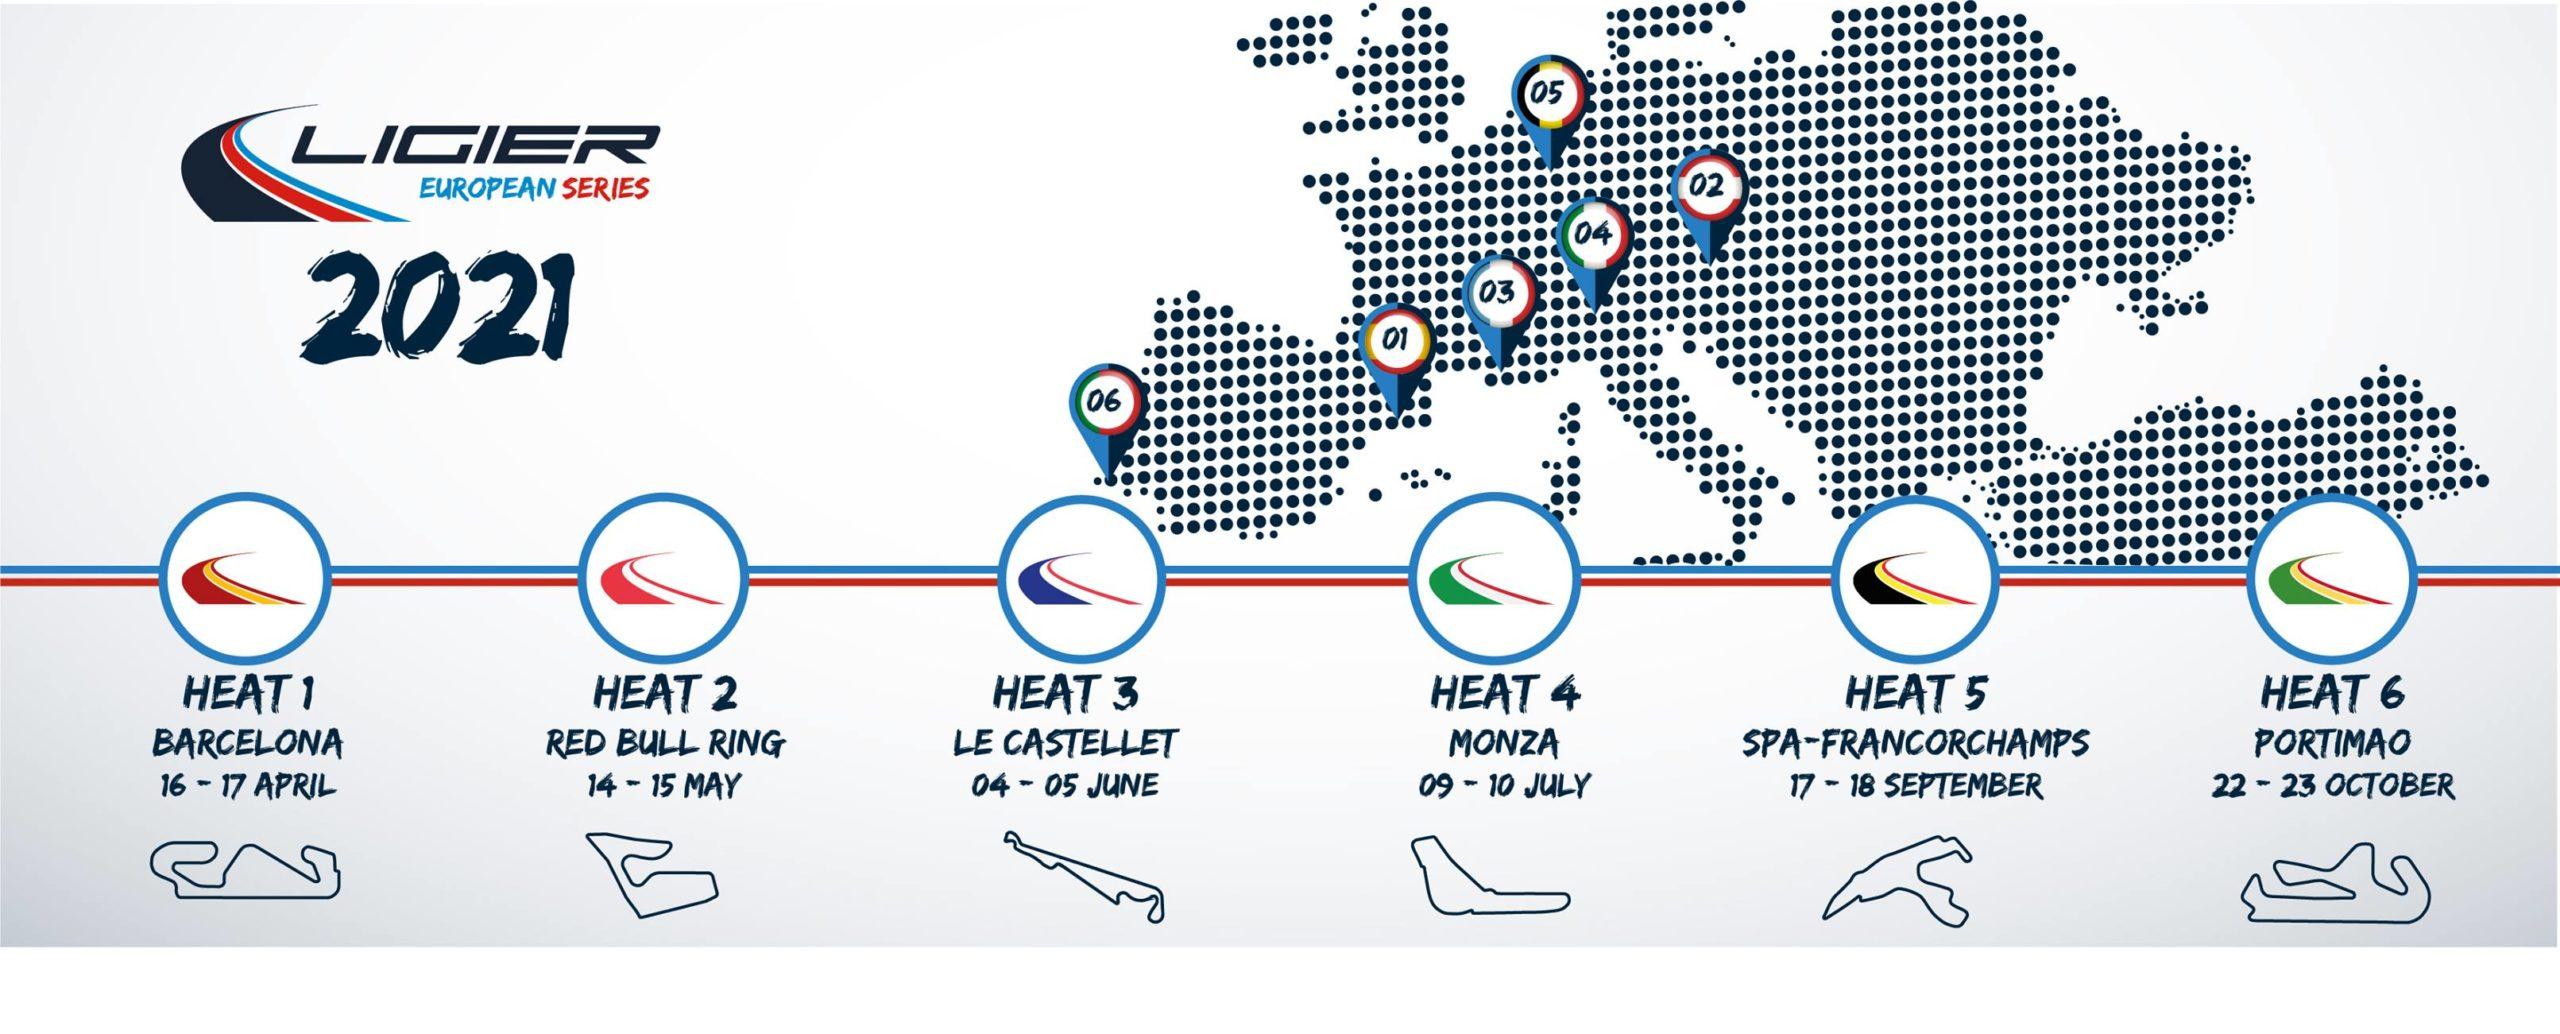 Ligier European Series 2021